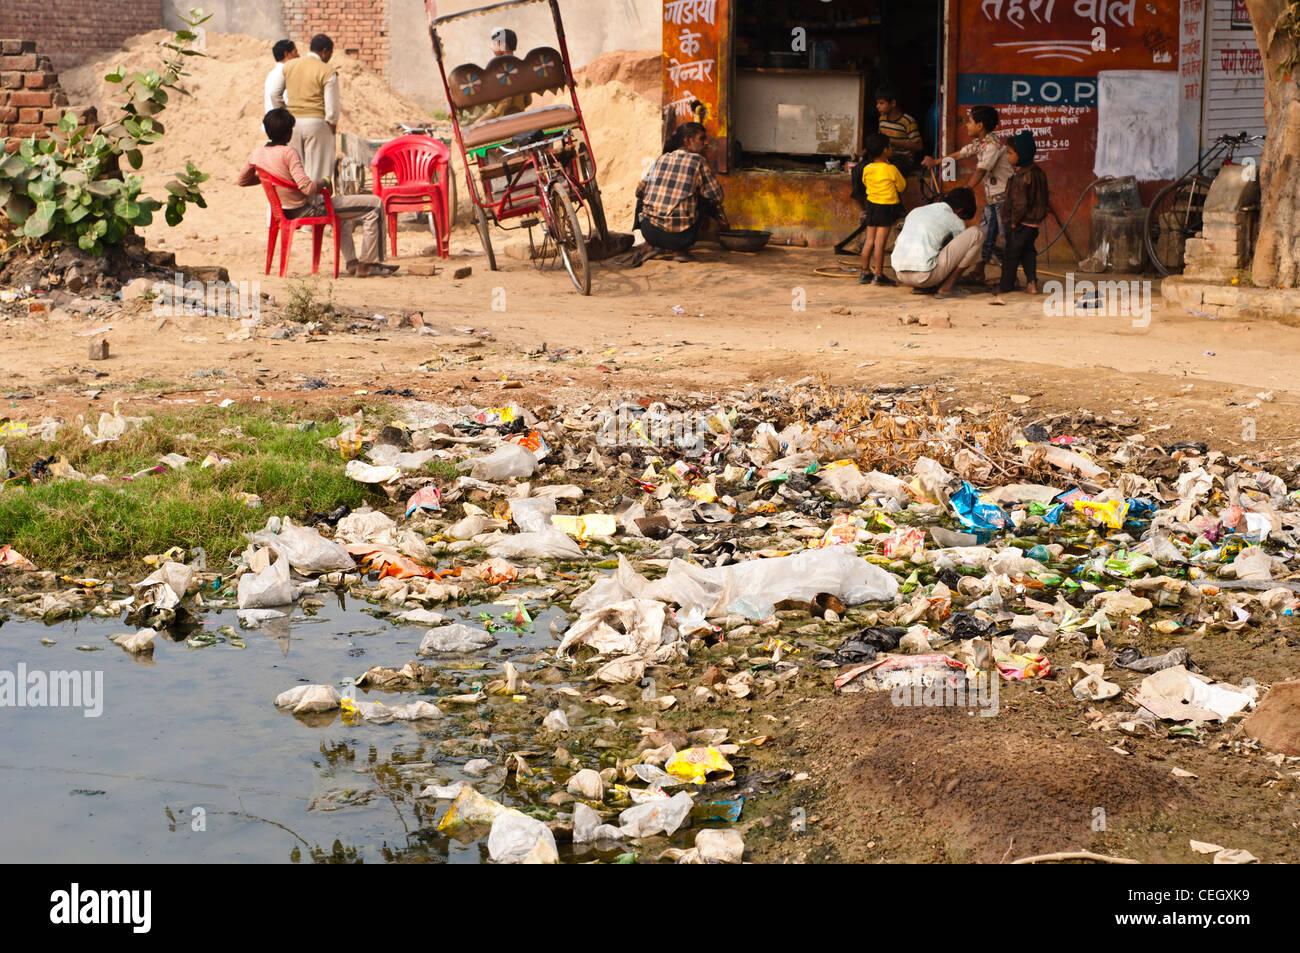 Rubbish in the overspill sewage, Vrindavan, Uttar Pradesh, India - Stock Image